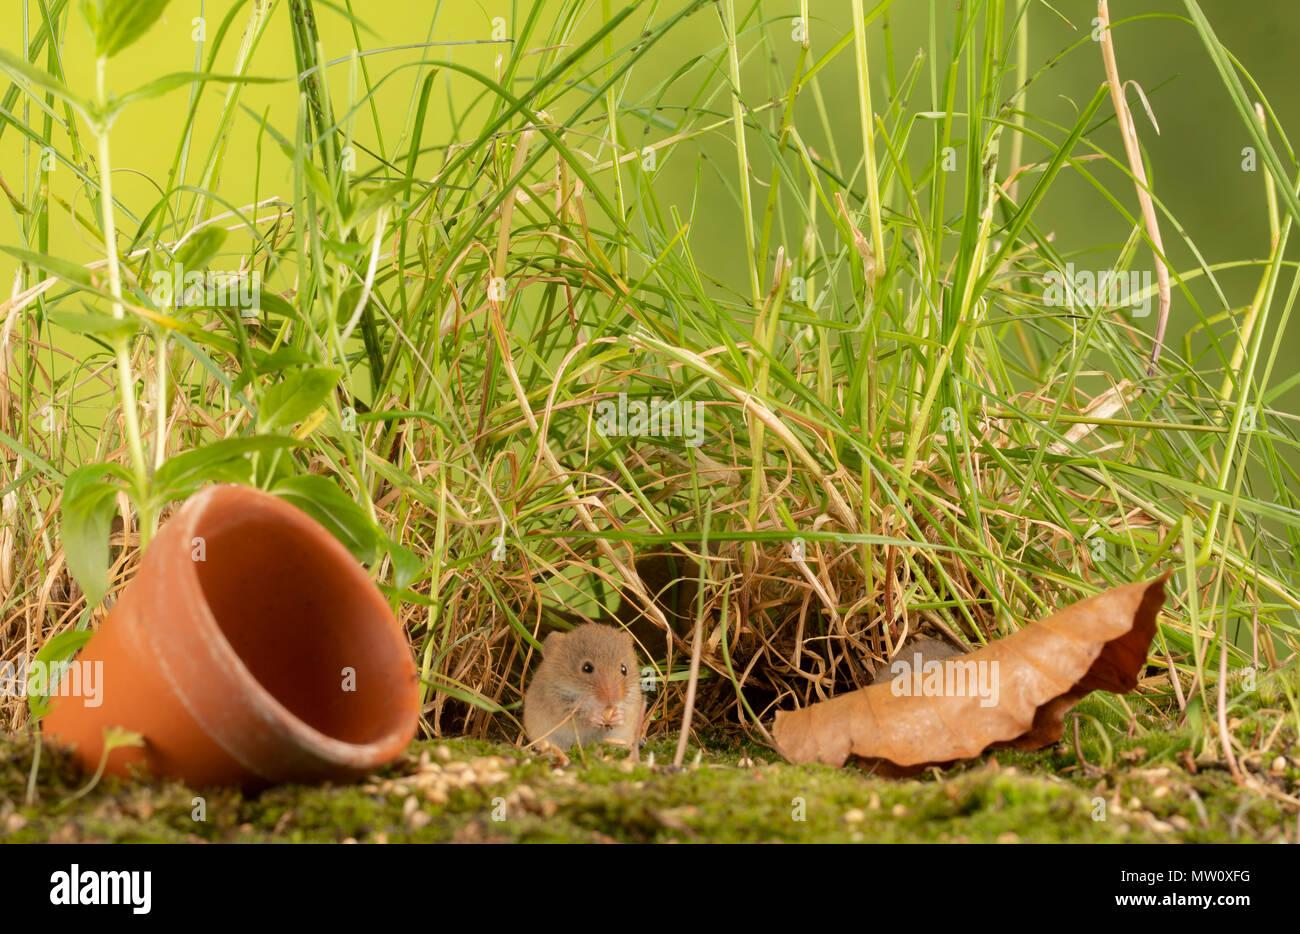 Wild harvest Maus Futter für Saatgut Stockbild